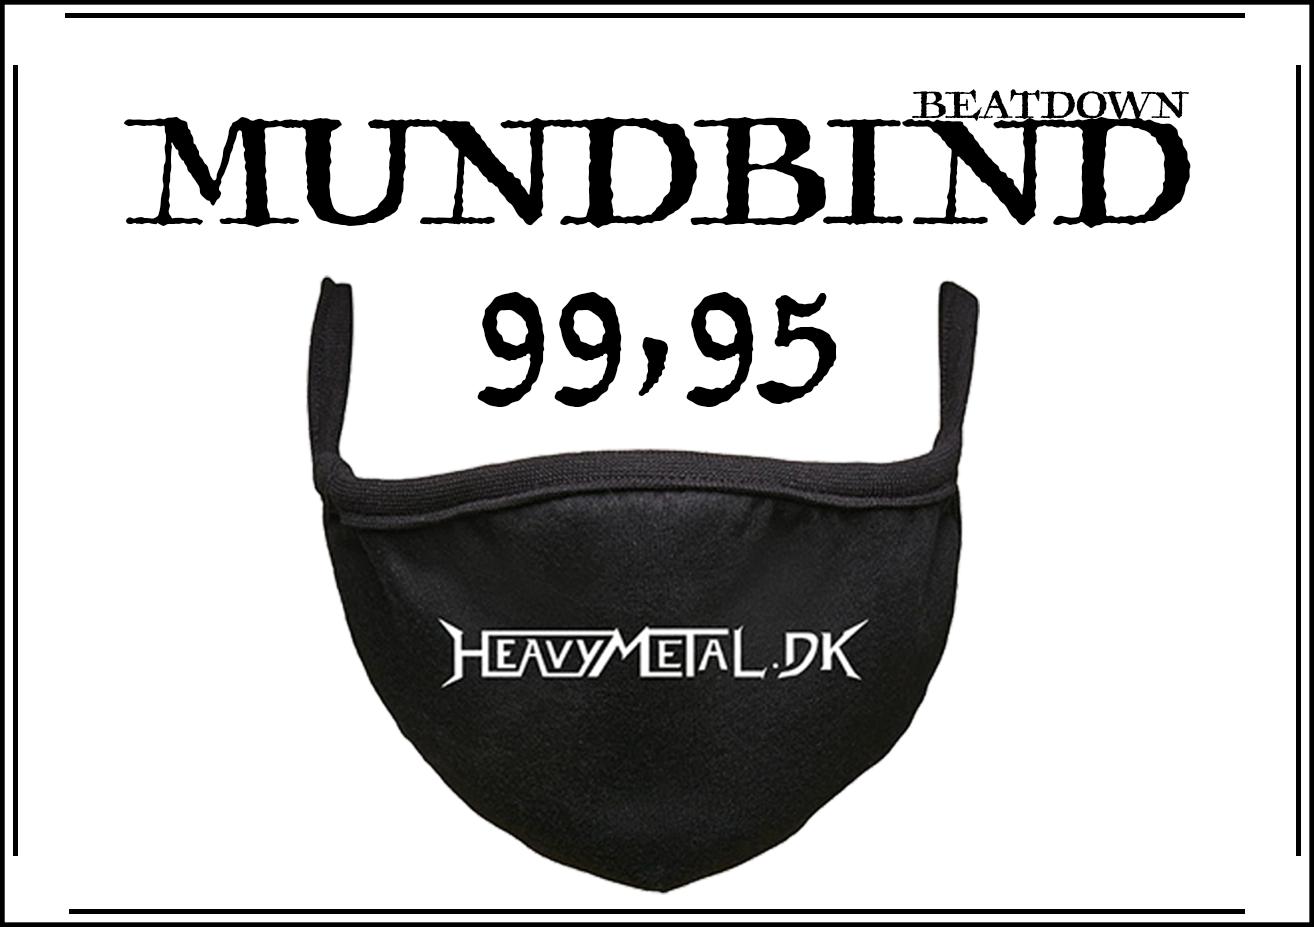 Mundbind